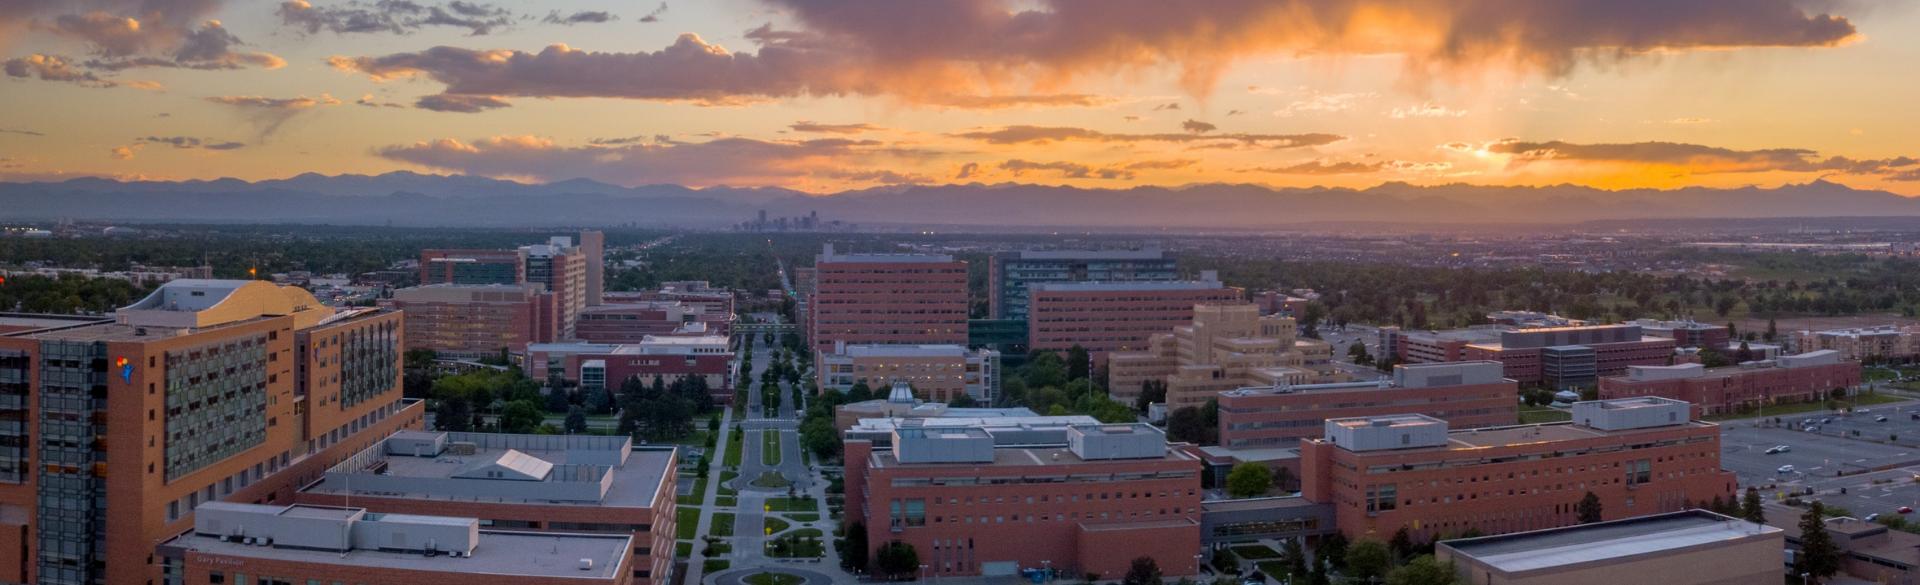 University of Colorado Anschutz Medical Campus